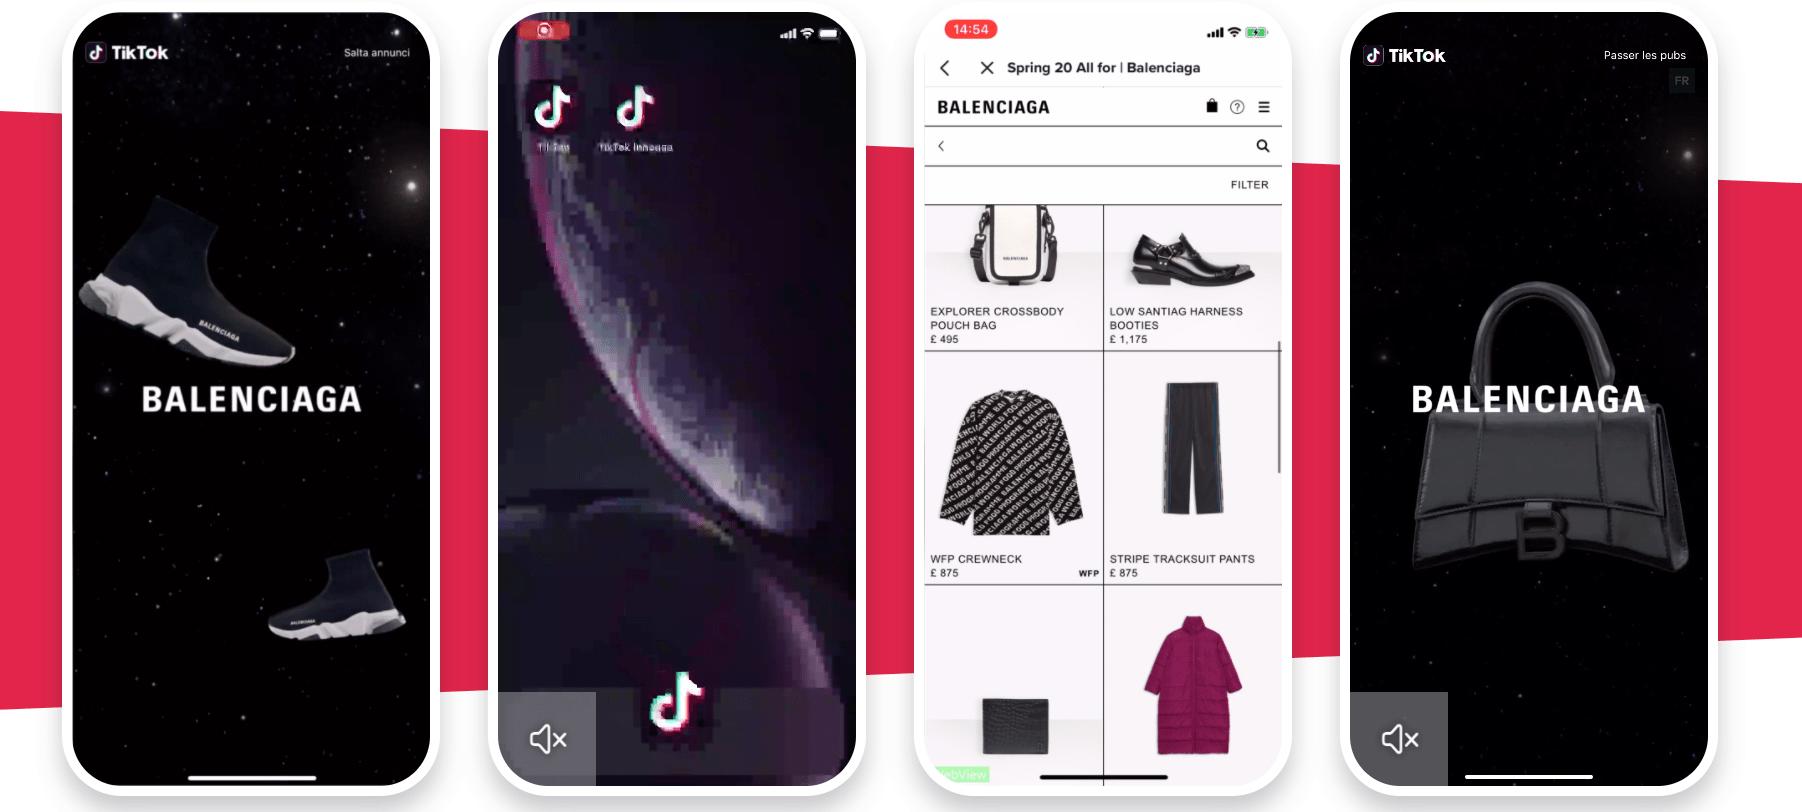 consigli video TikTok Balenciaga Ads